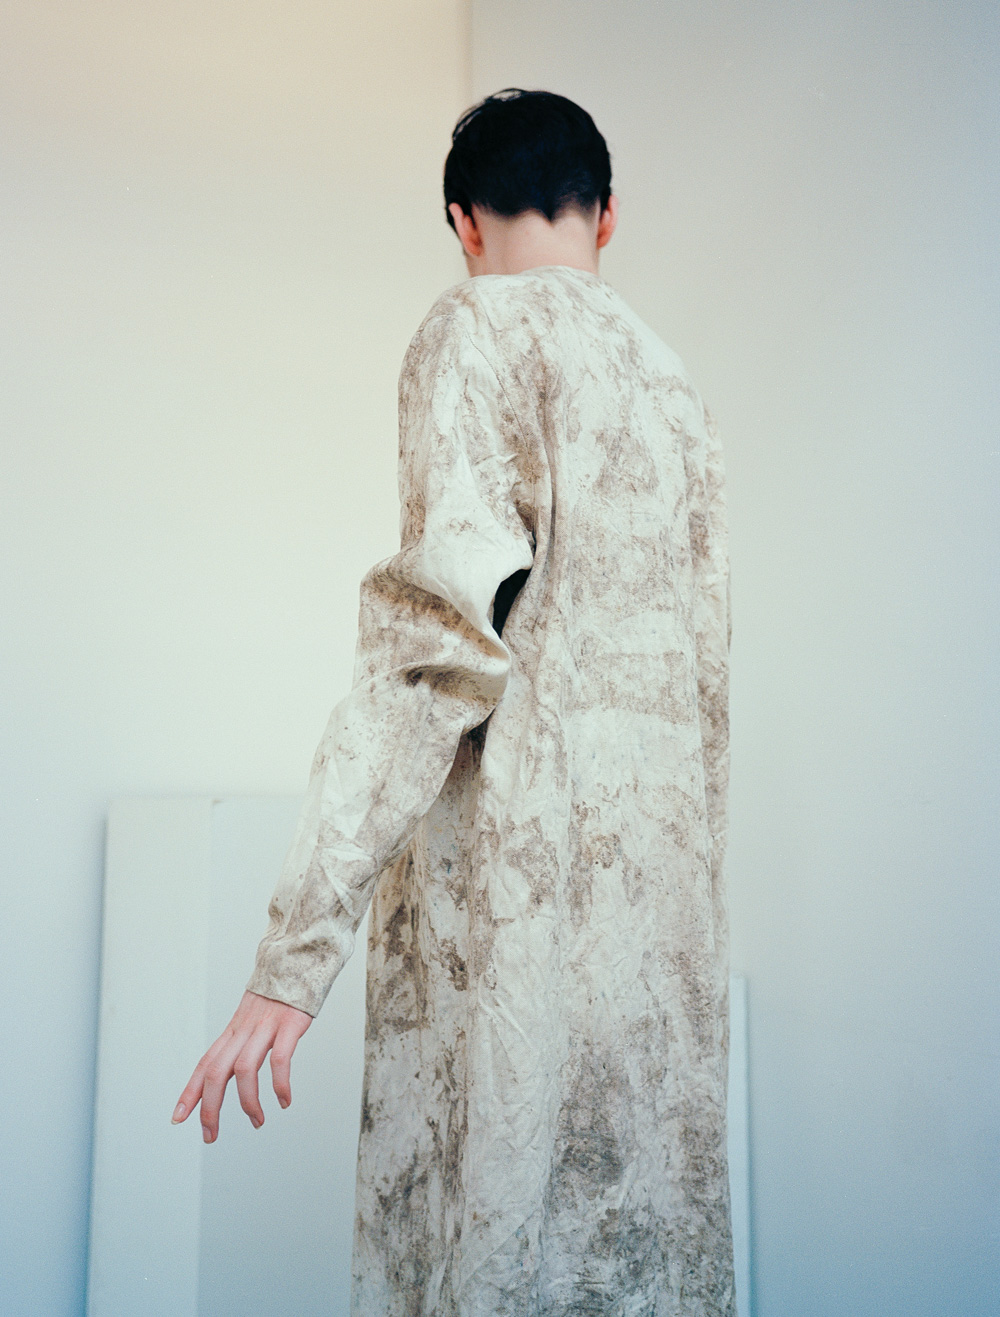 Yifei-Liu-7-2.jpg